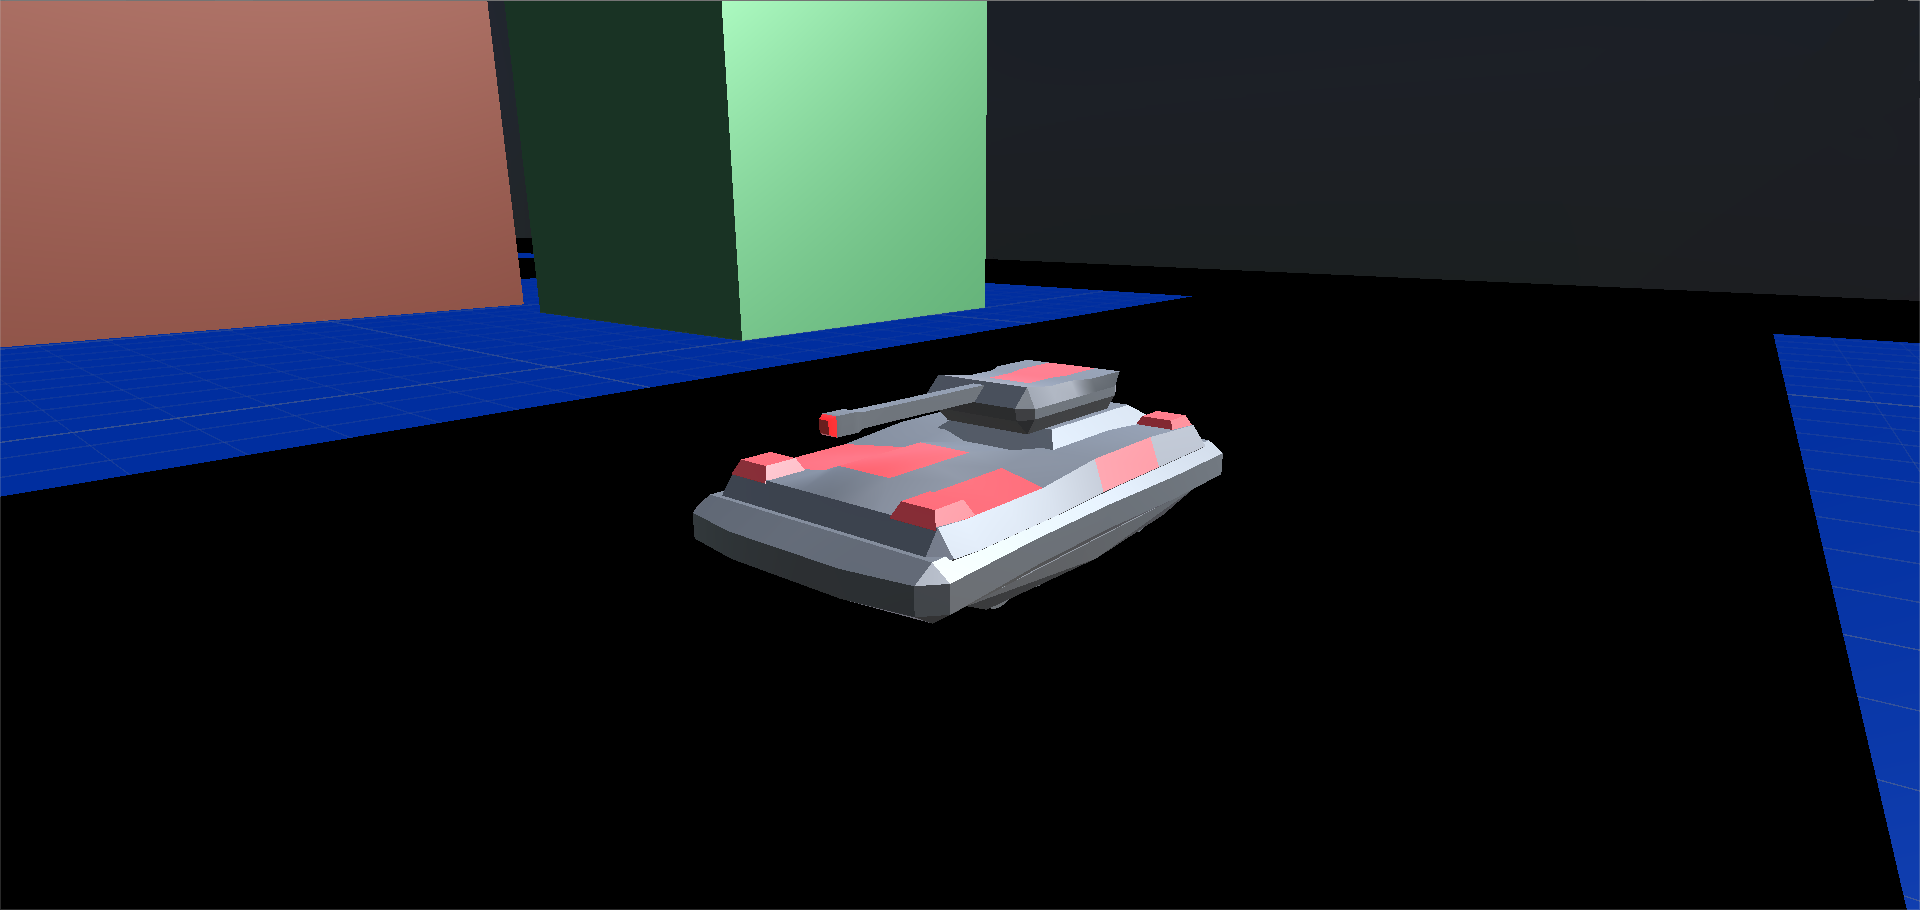 TanX VR